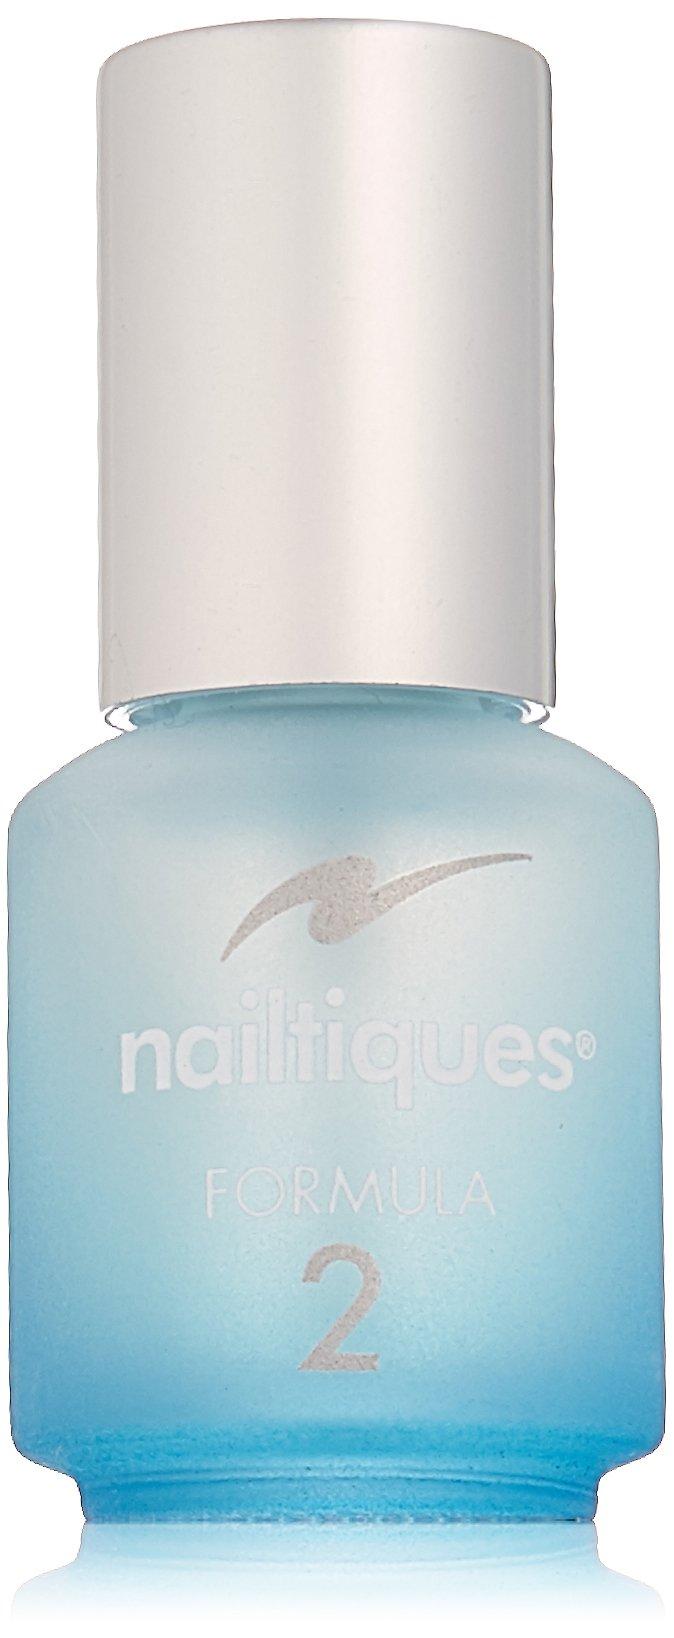 Nailtiques Nail Protein Formula, 2, 0.25 Ounce